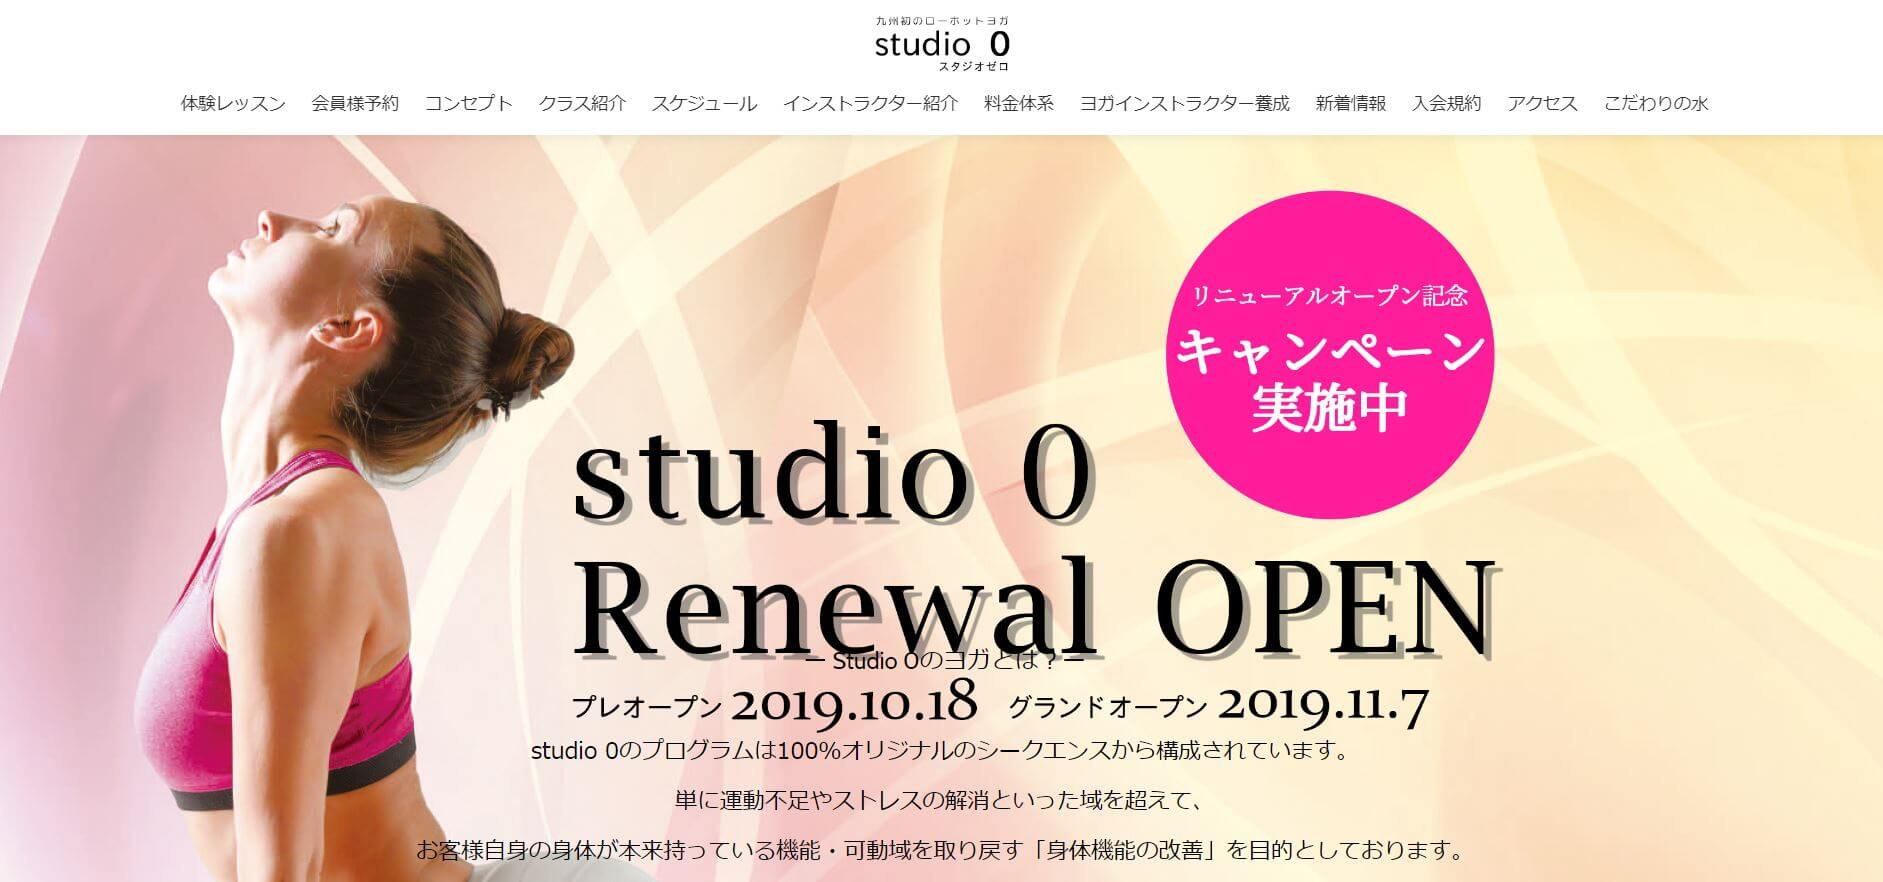 studio 0(スタジオゼロ)